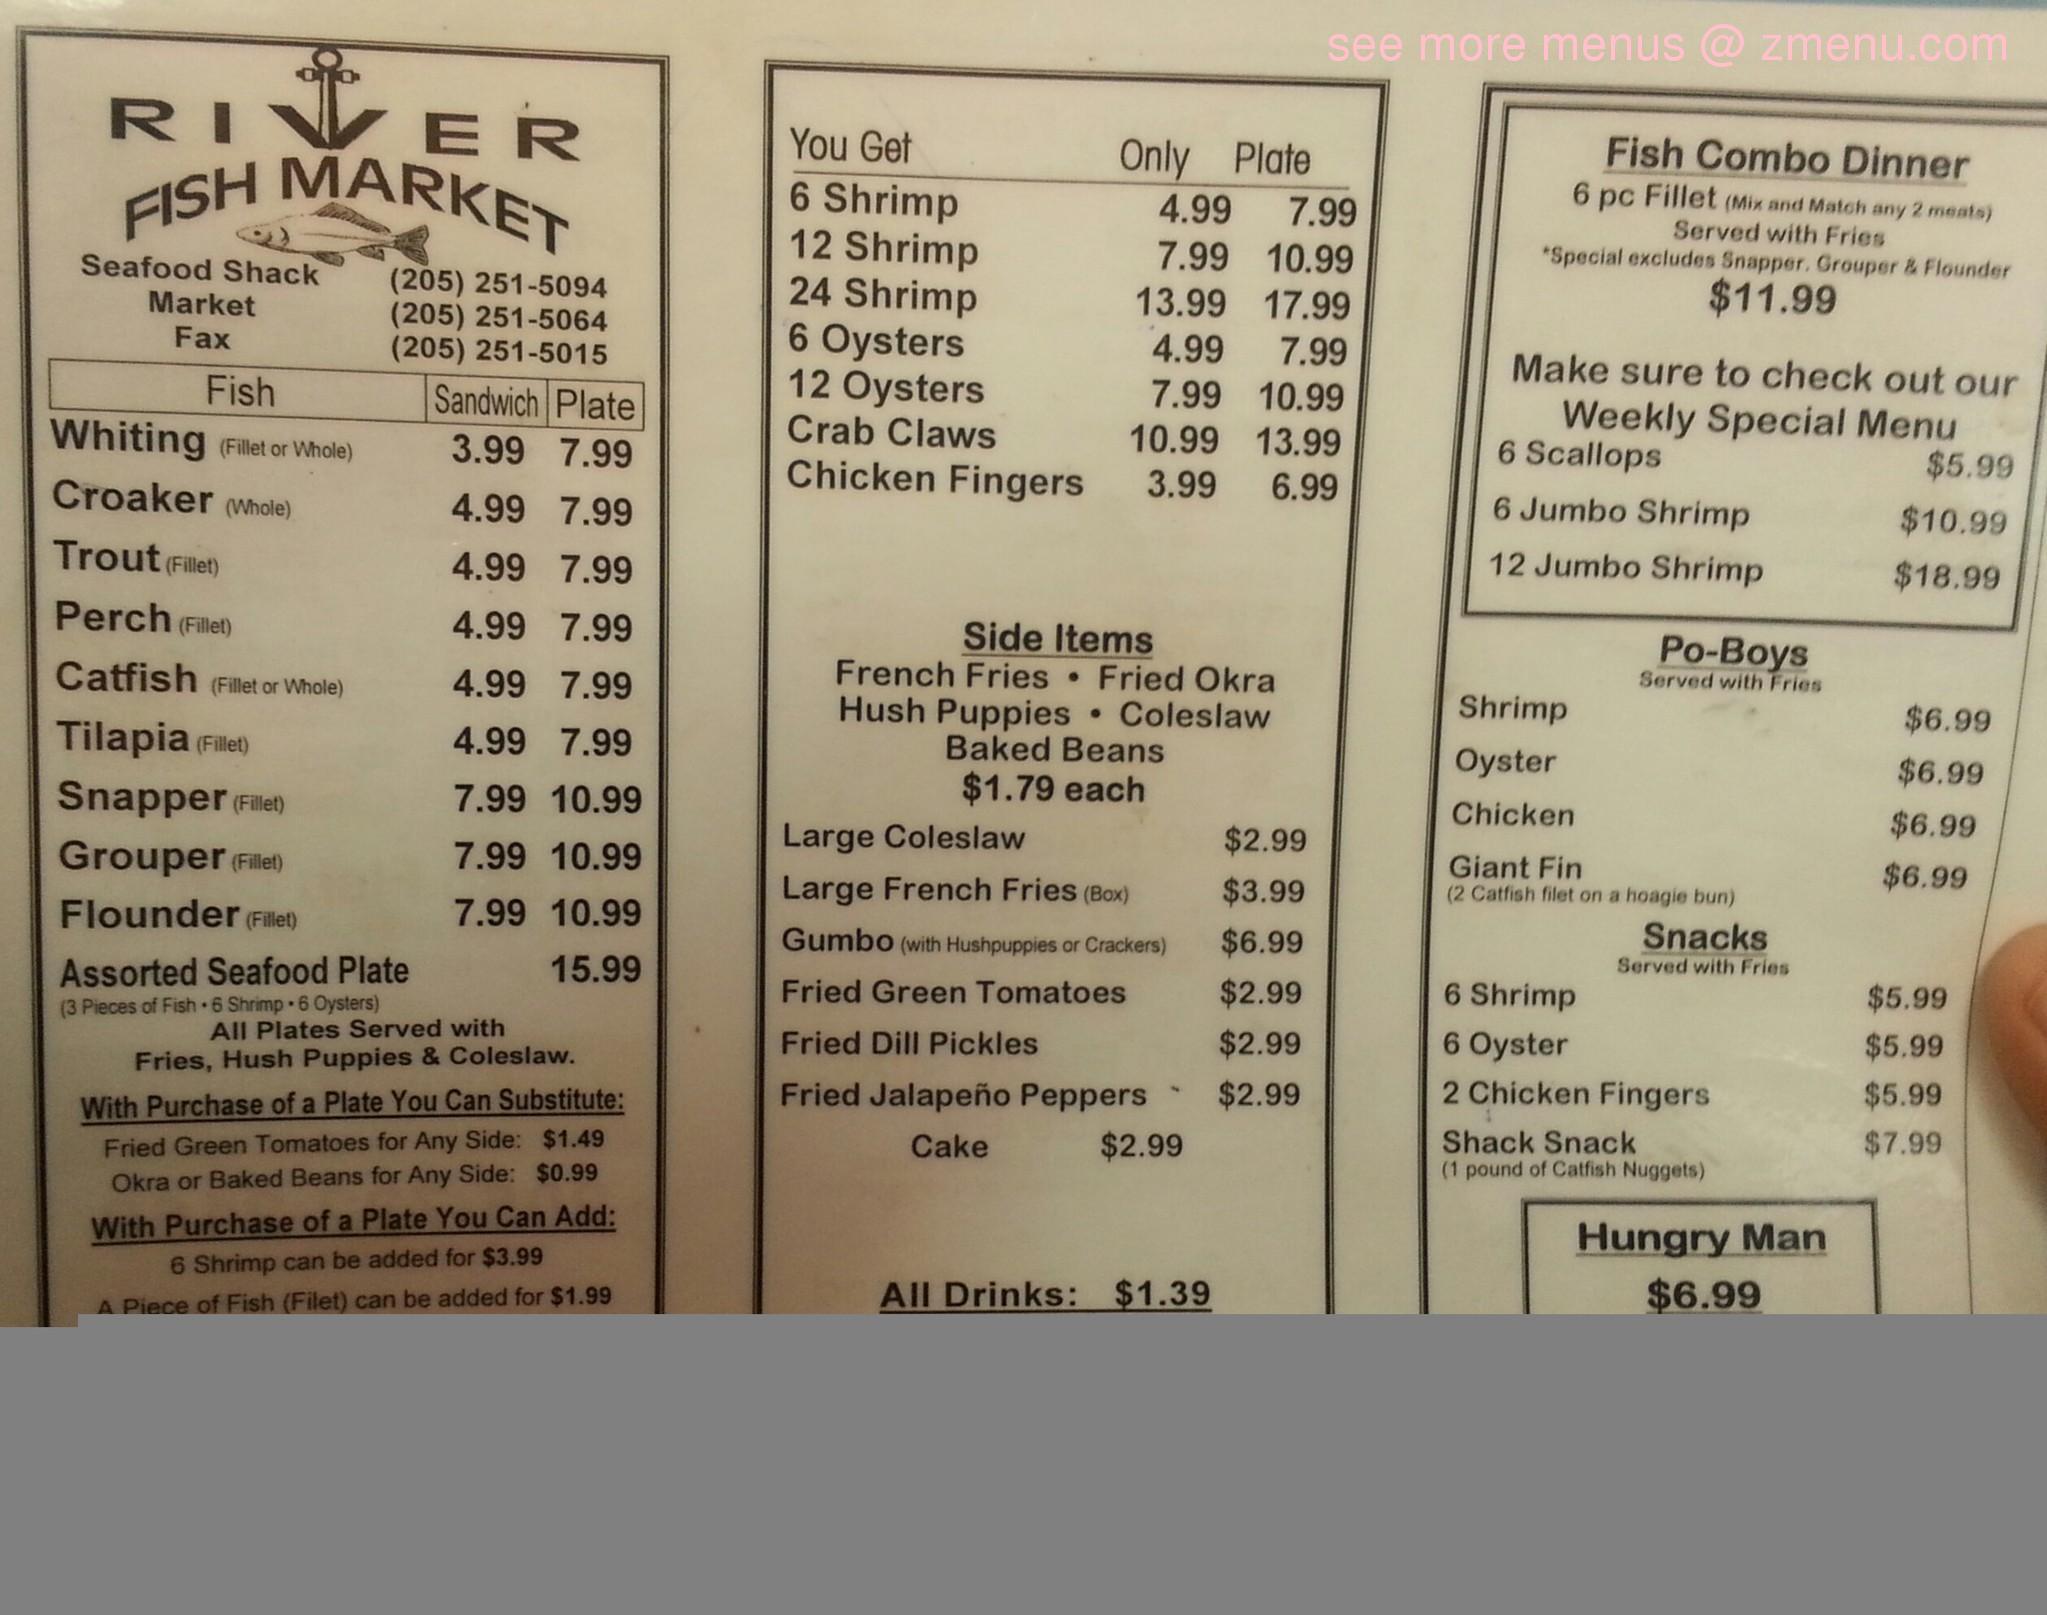 Online Menu of River Fish Market Restaurant, Birmingham, Alabama, 35234 - Zmenu